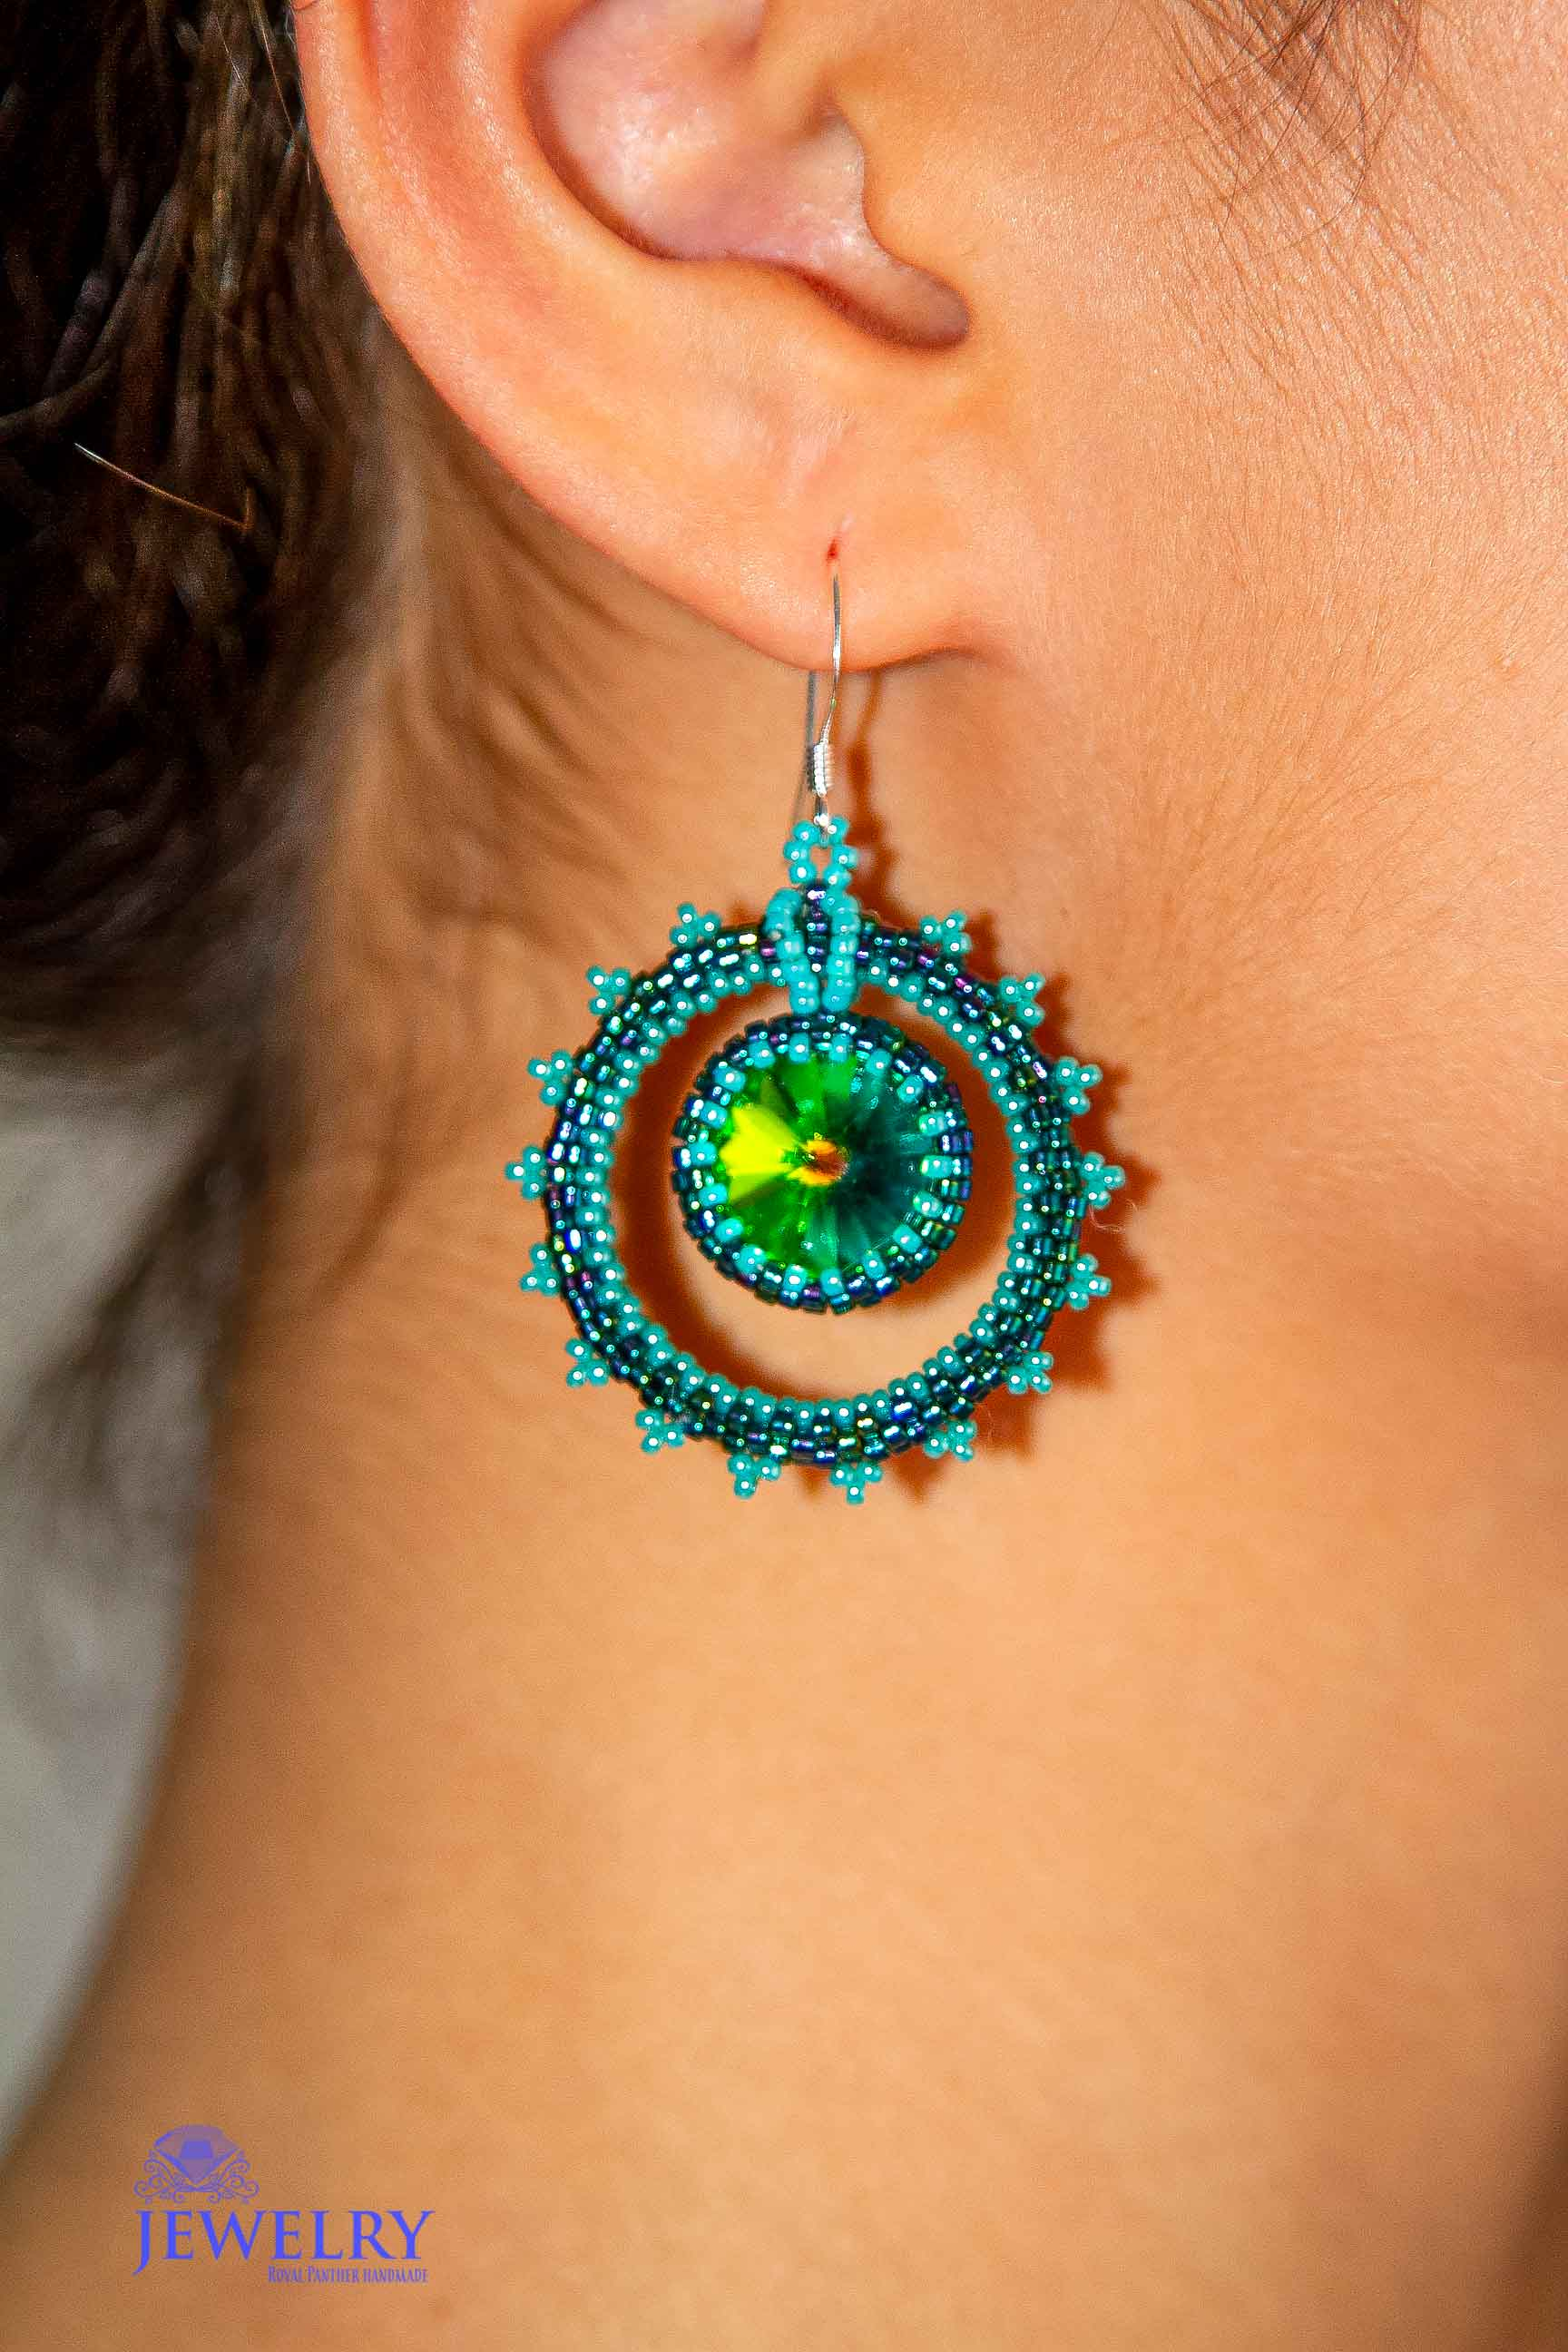 Jewellery in Australia